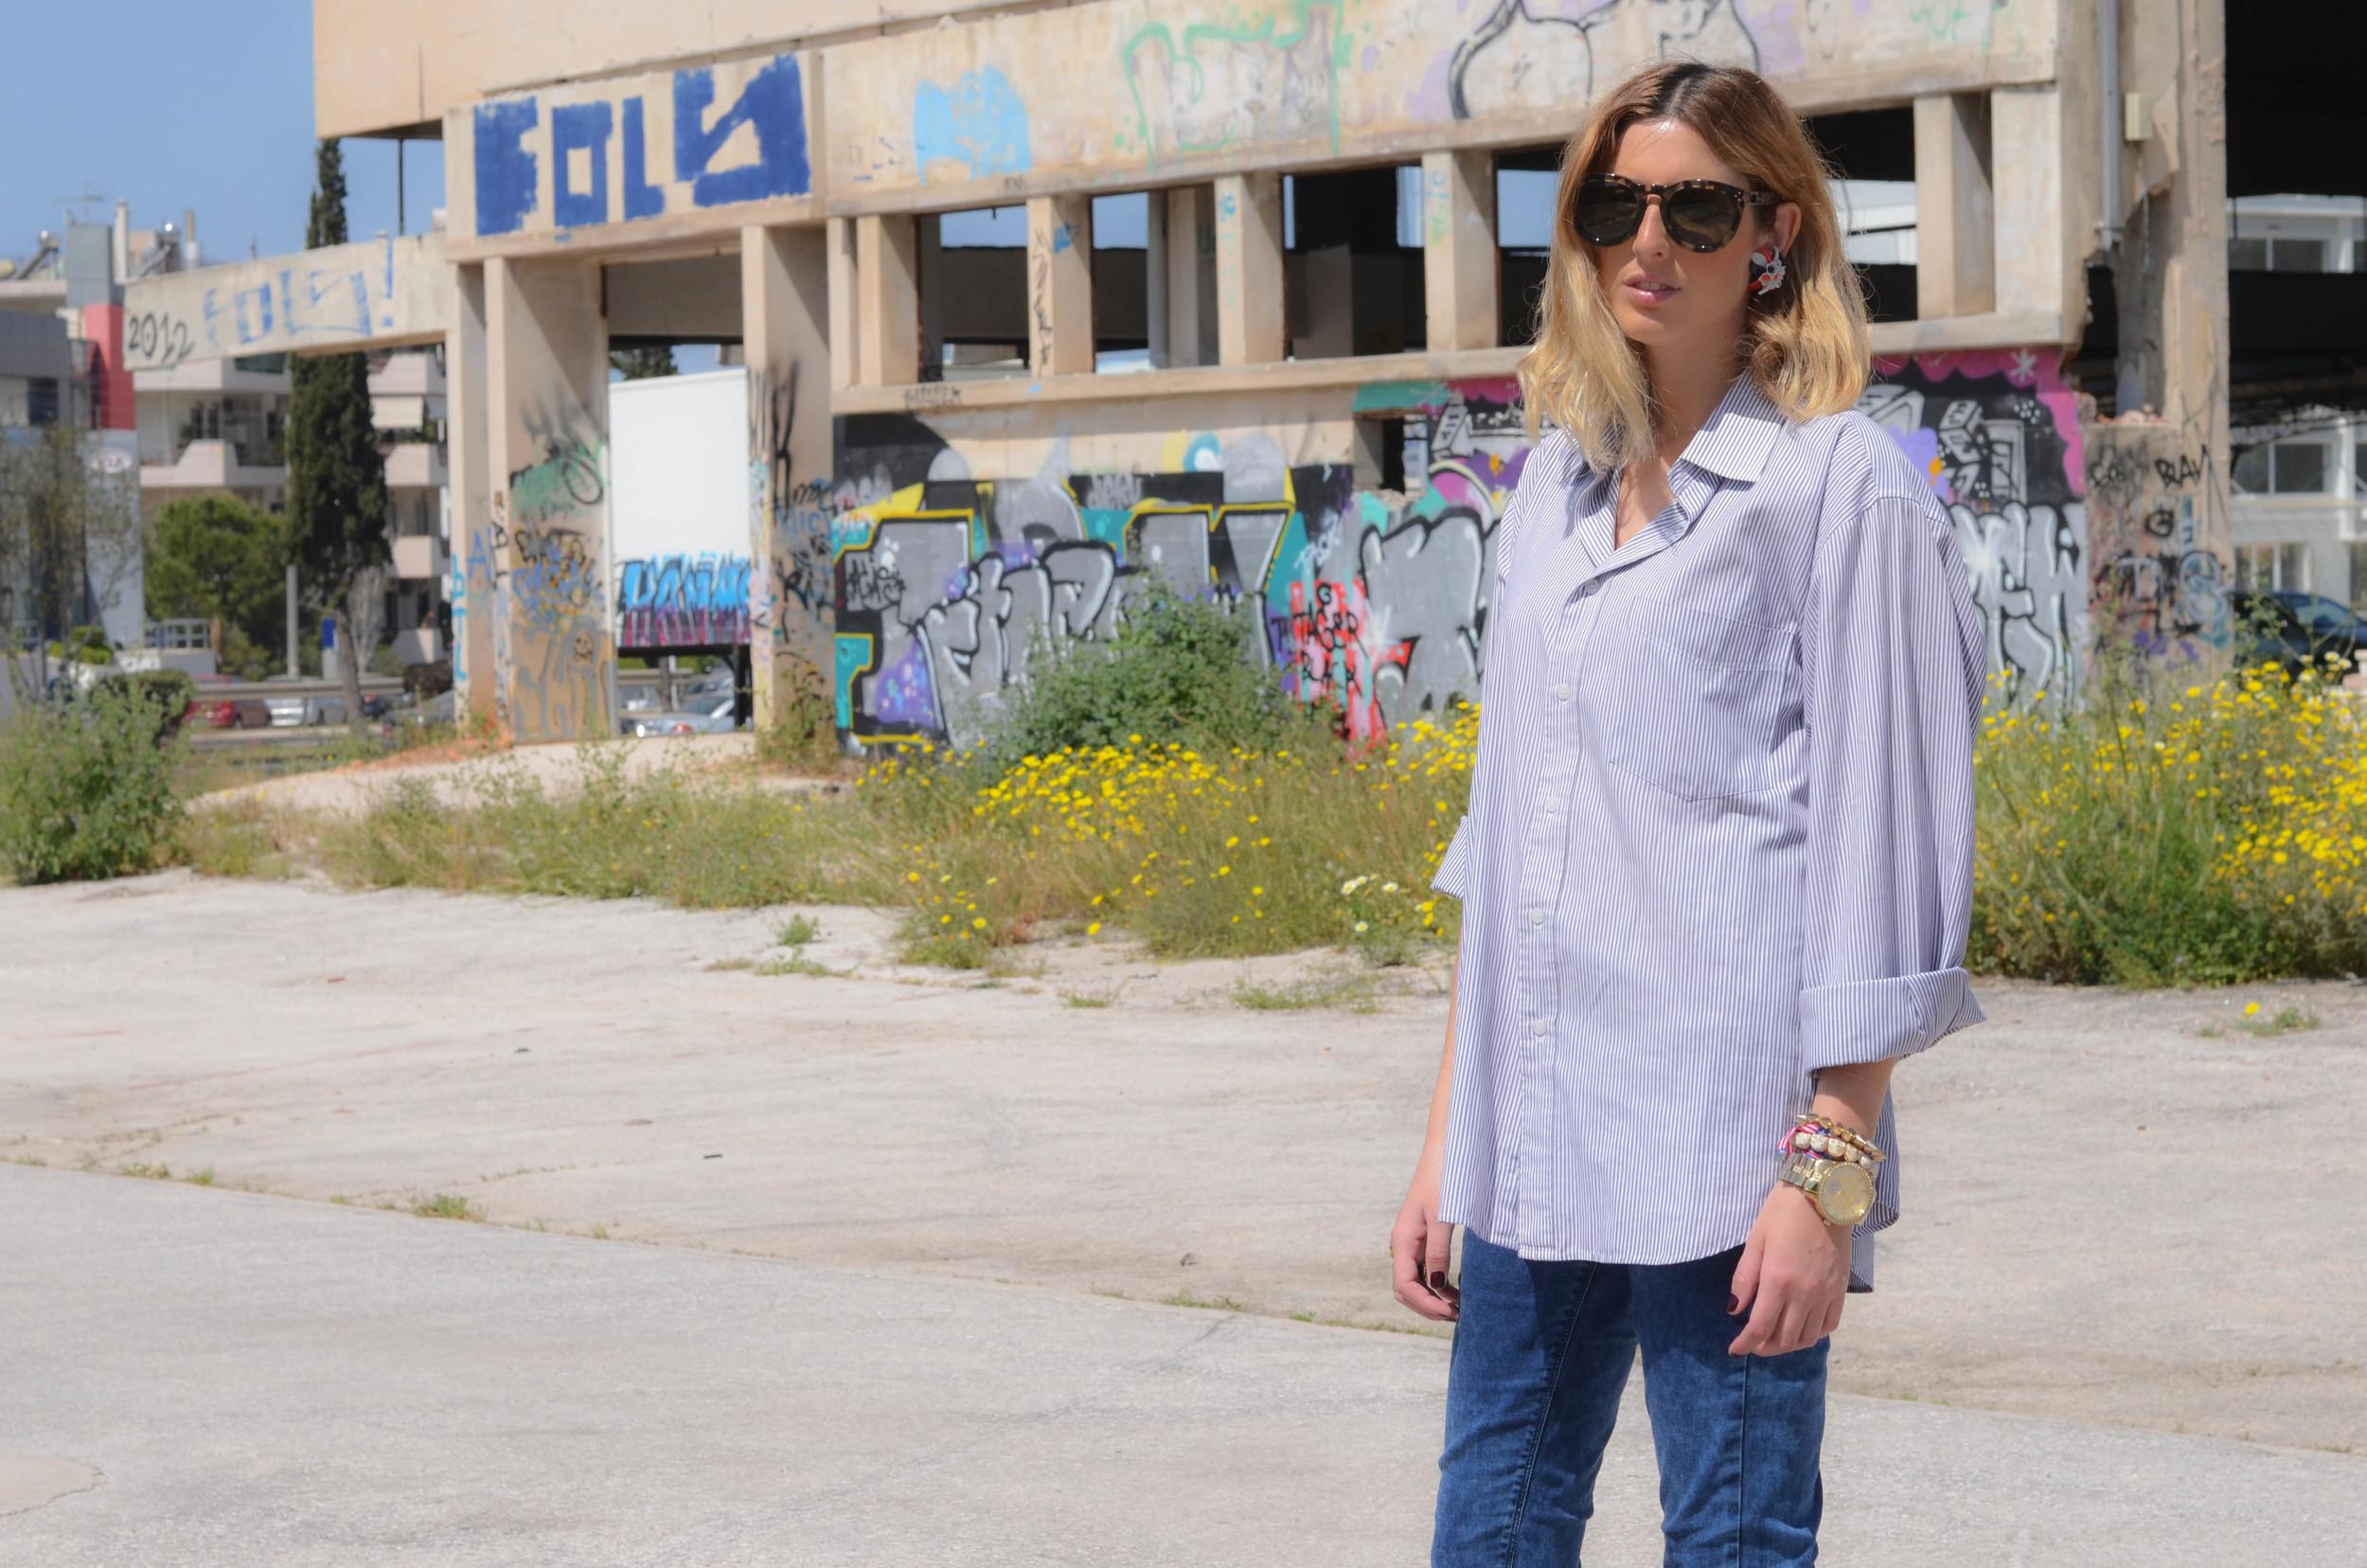 big_shirt_skinny_jeans4.jpg